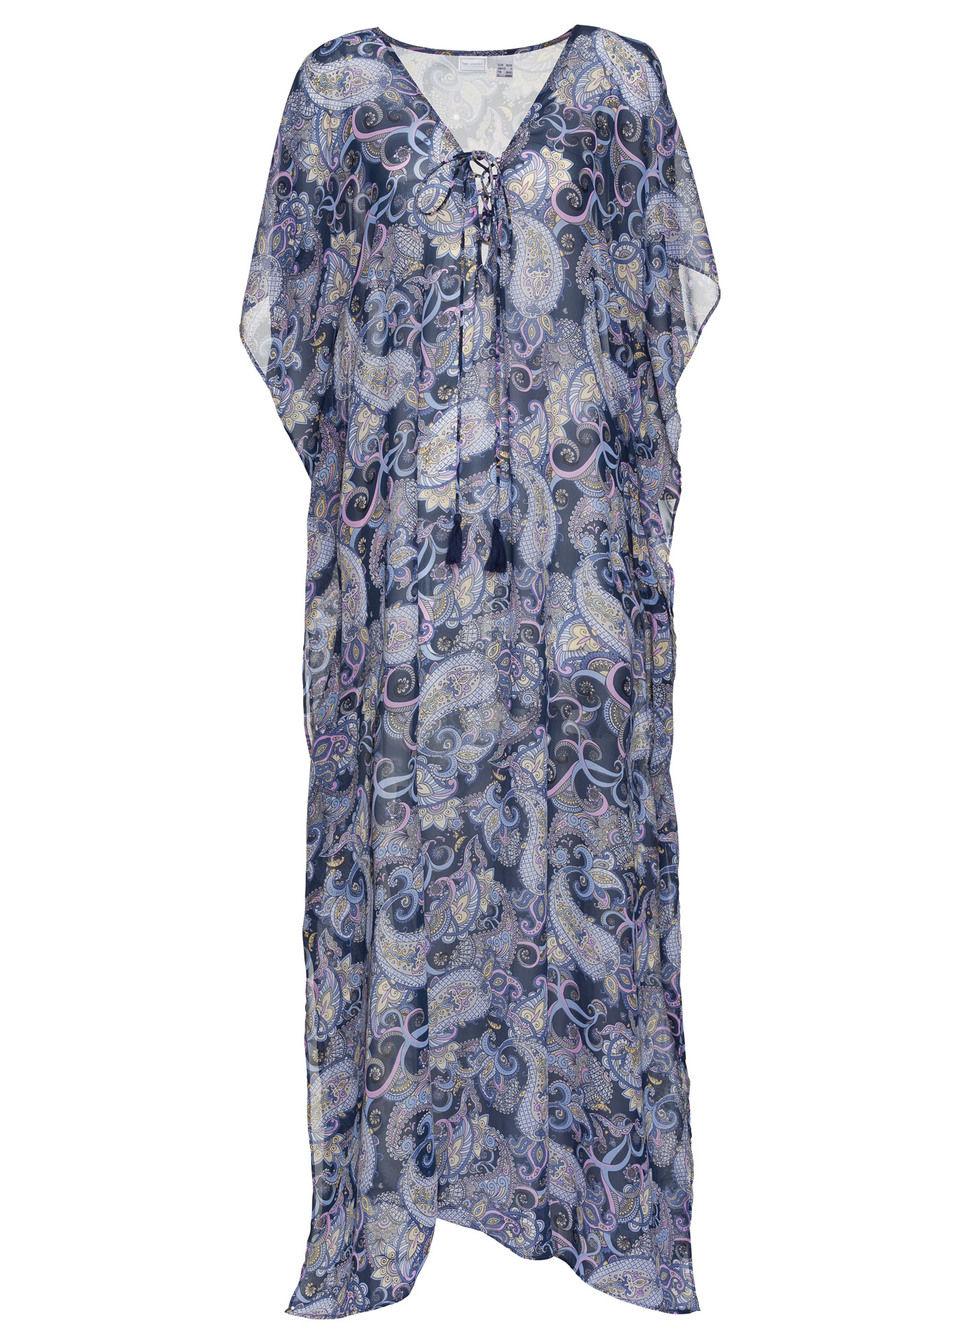 Sukienka plażowa maxi bonprix niebiesko-lila